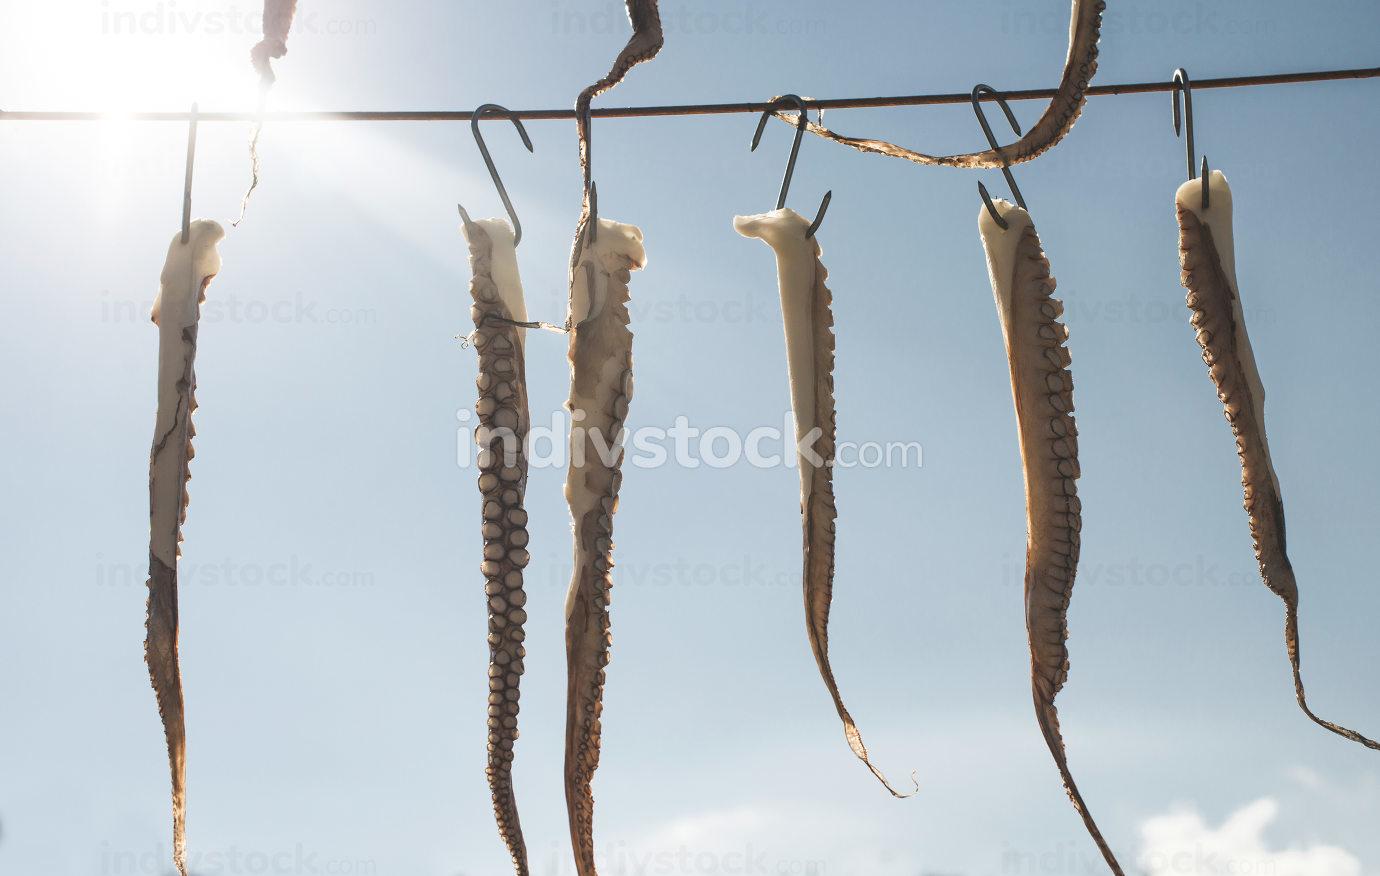 Octopus on rope on sky background. Greece, Gythio